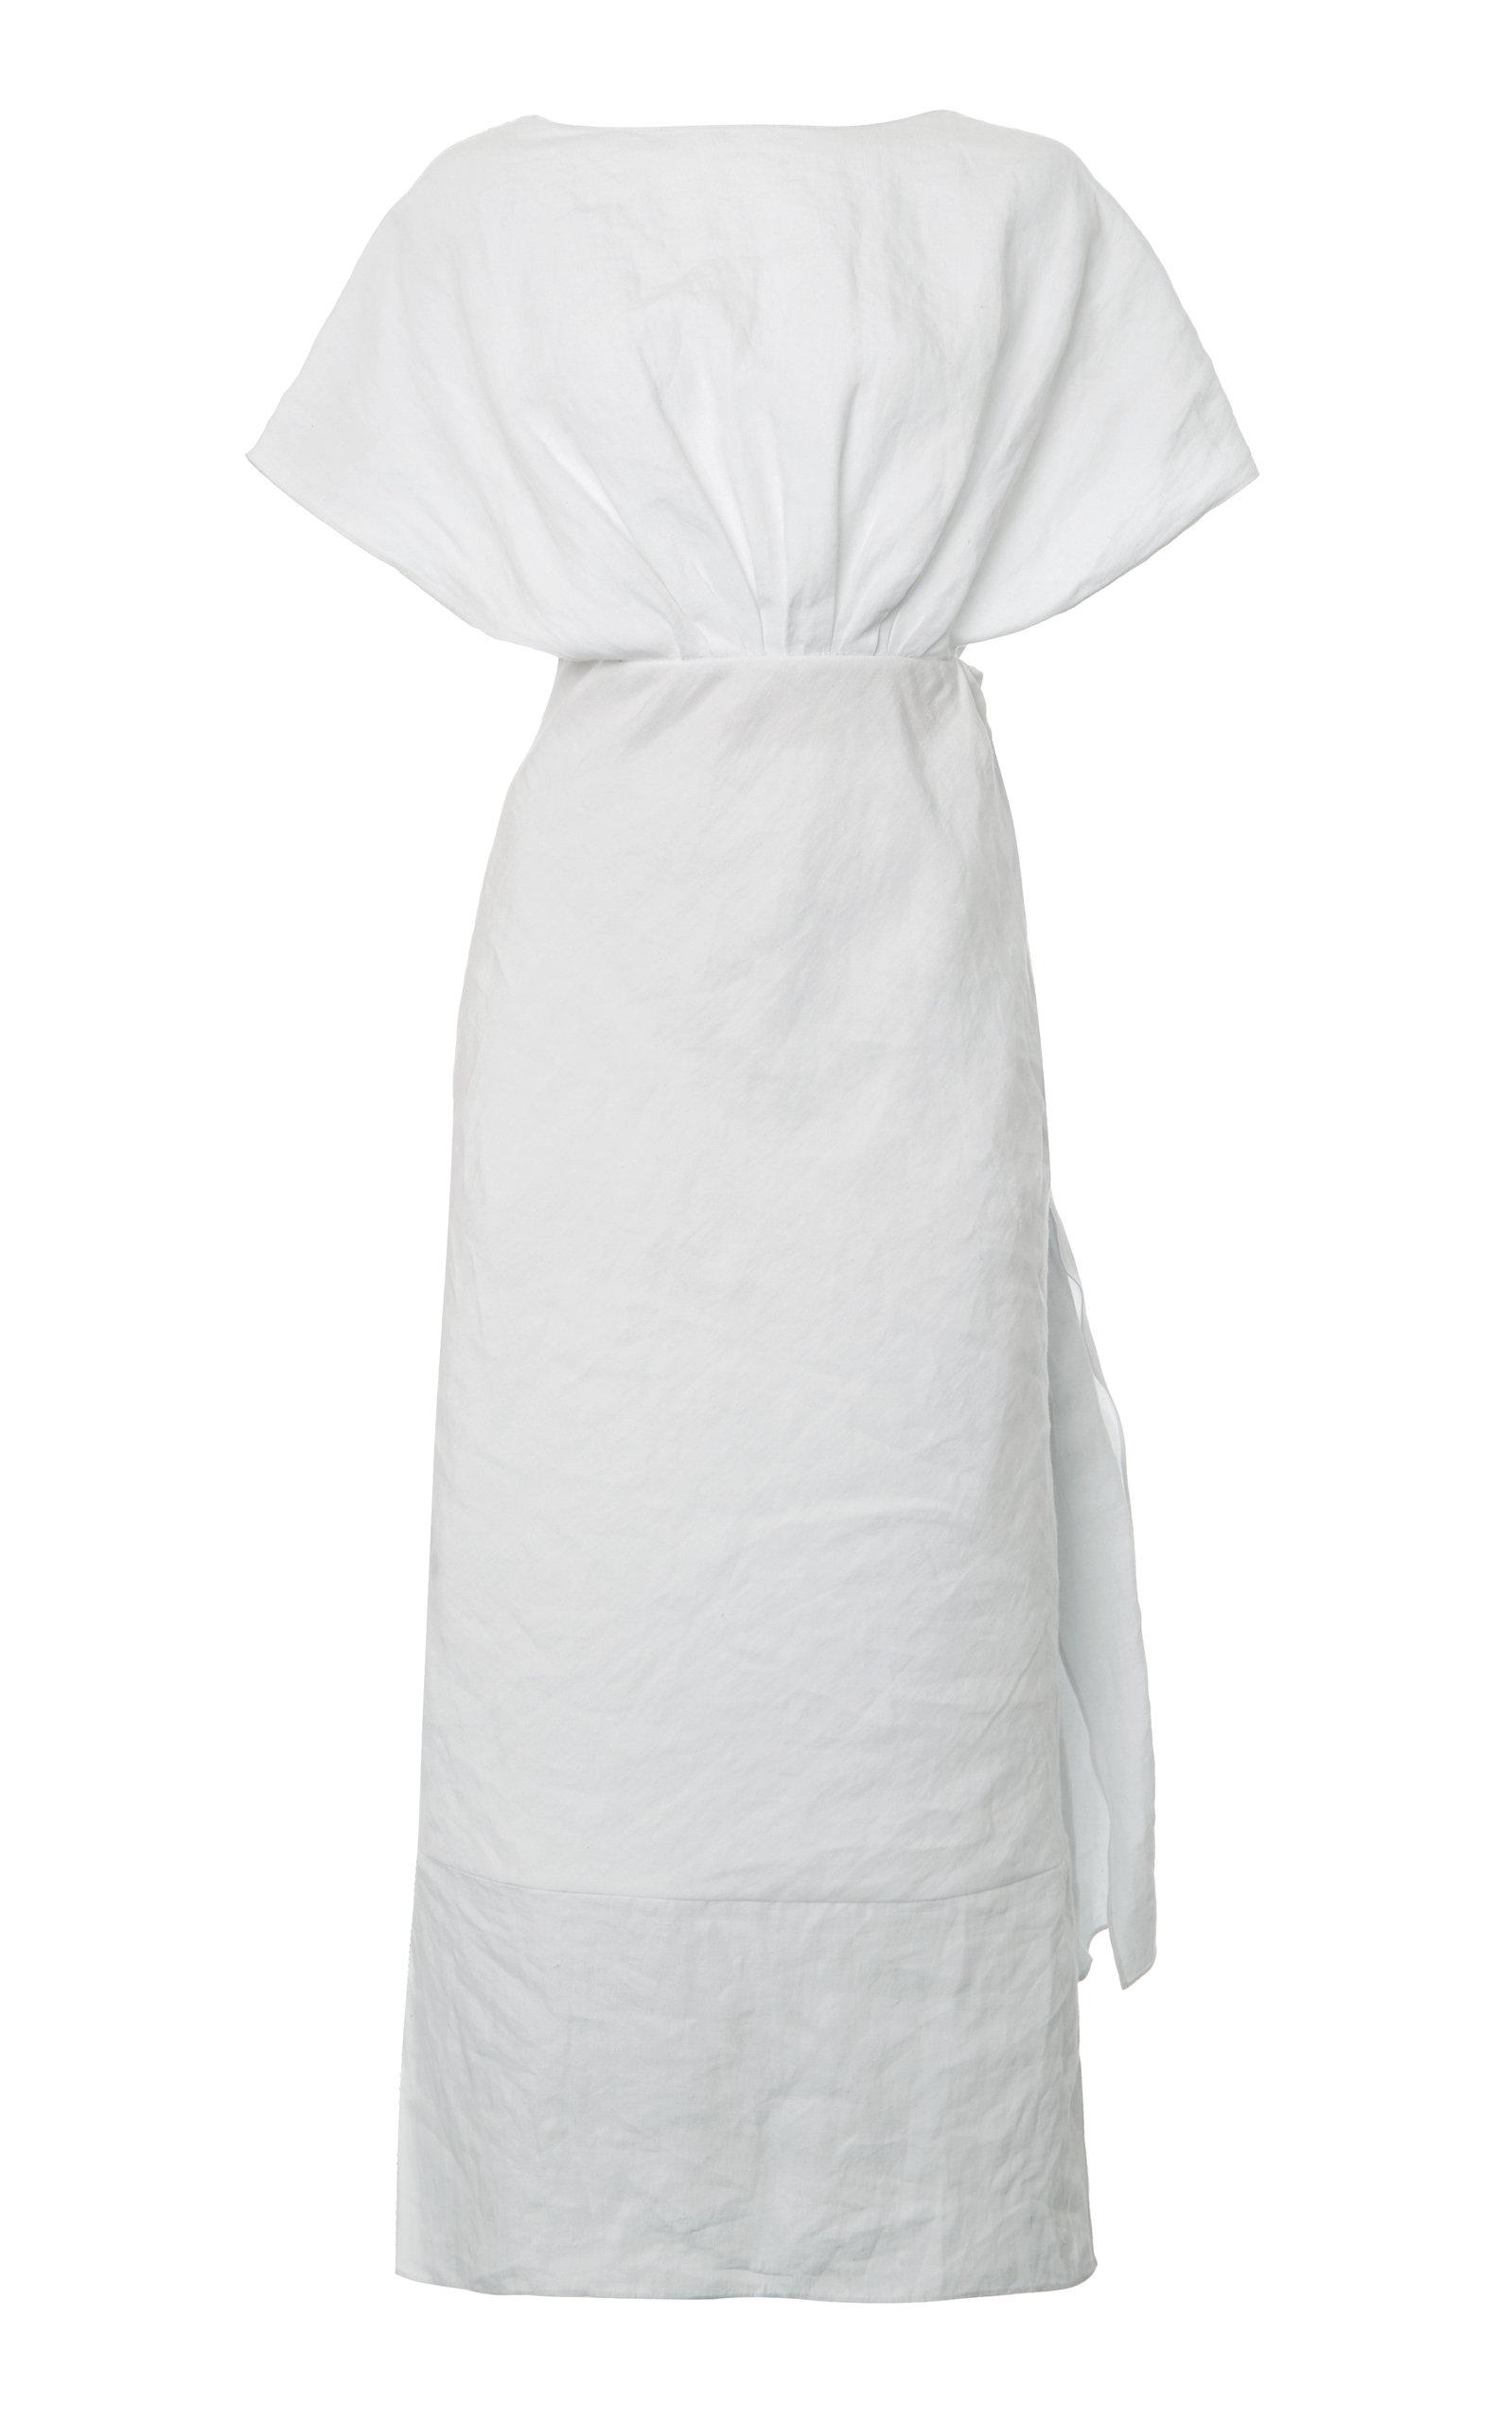 Buy Miu Miu Drape-Detailed Linen Midi Dress online, shop Miu Miu at the best price